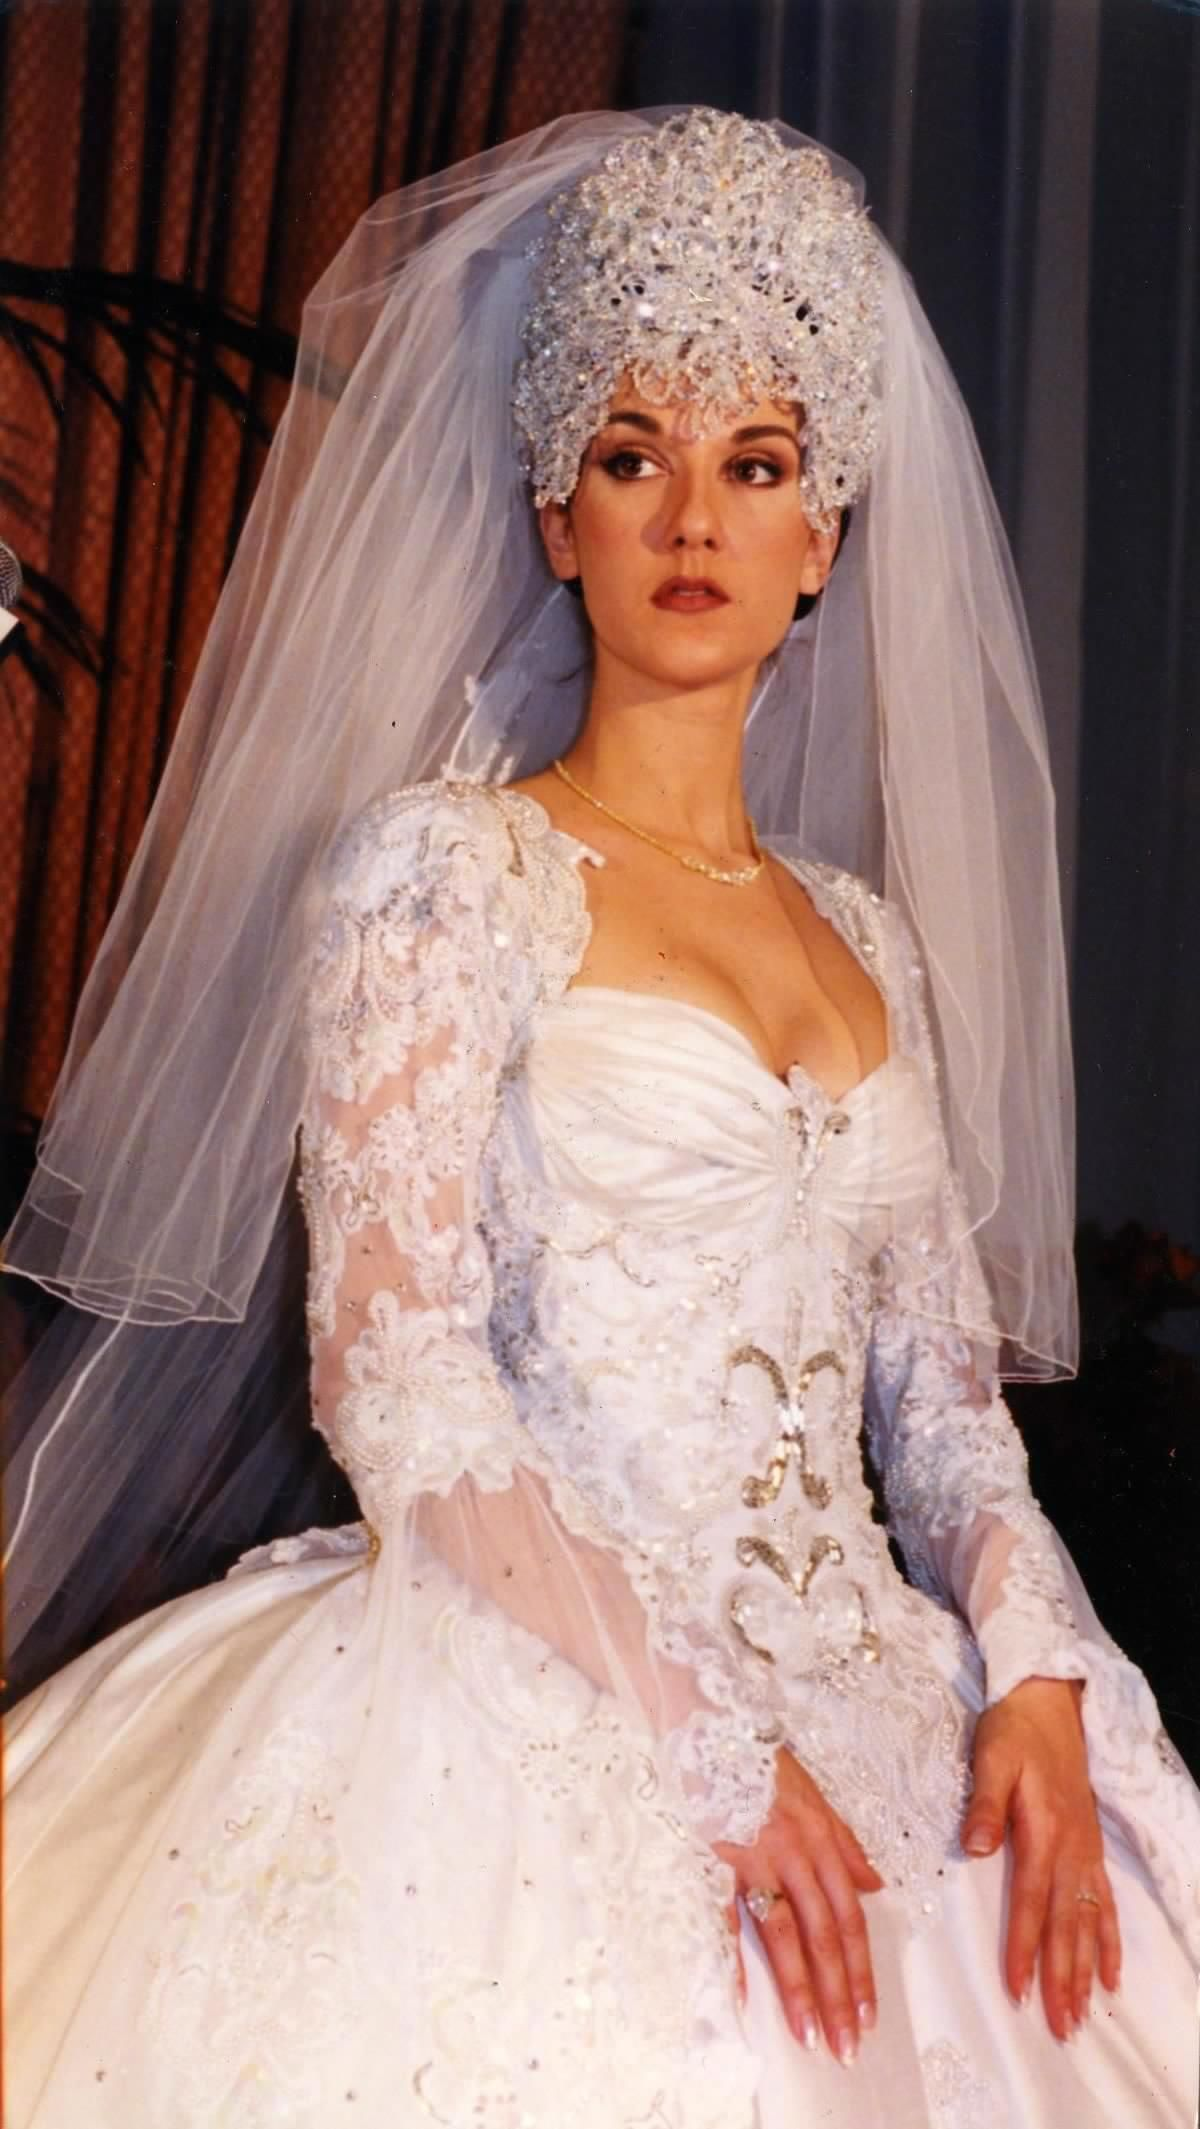 Famous wedding dresses  Celine Dion  Famous celebrity wedding gowns  Pinterest  Wedding